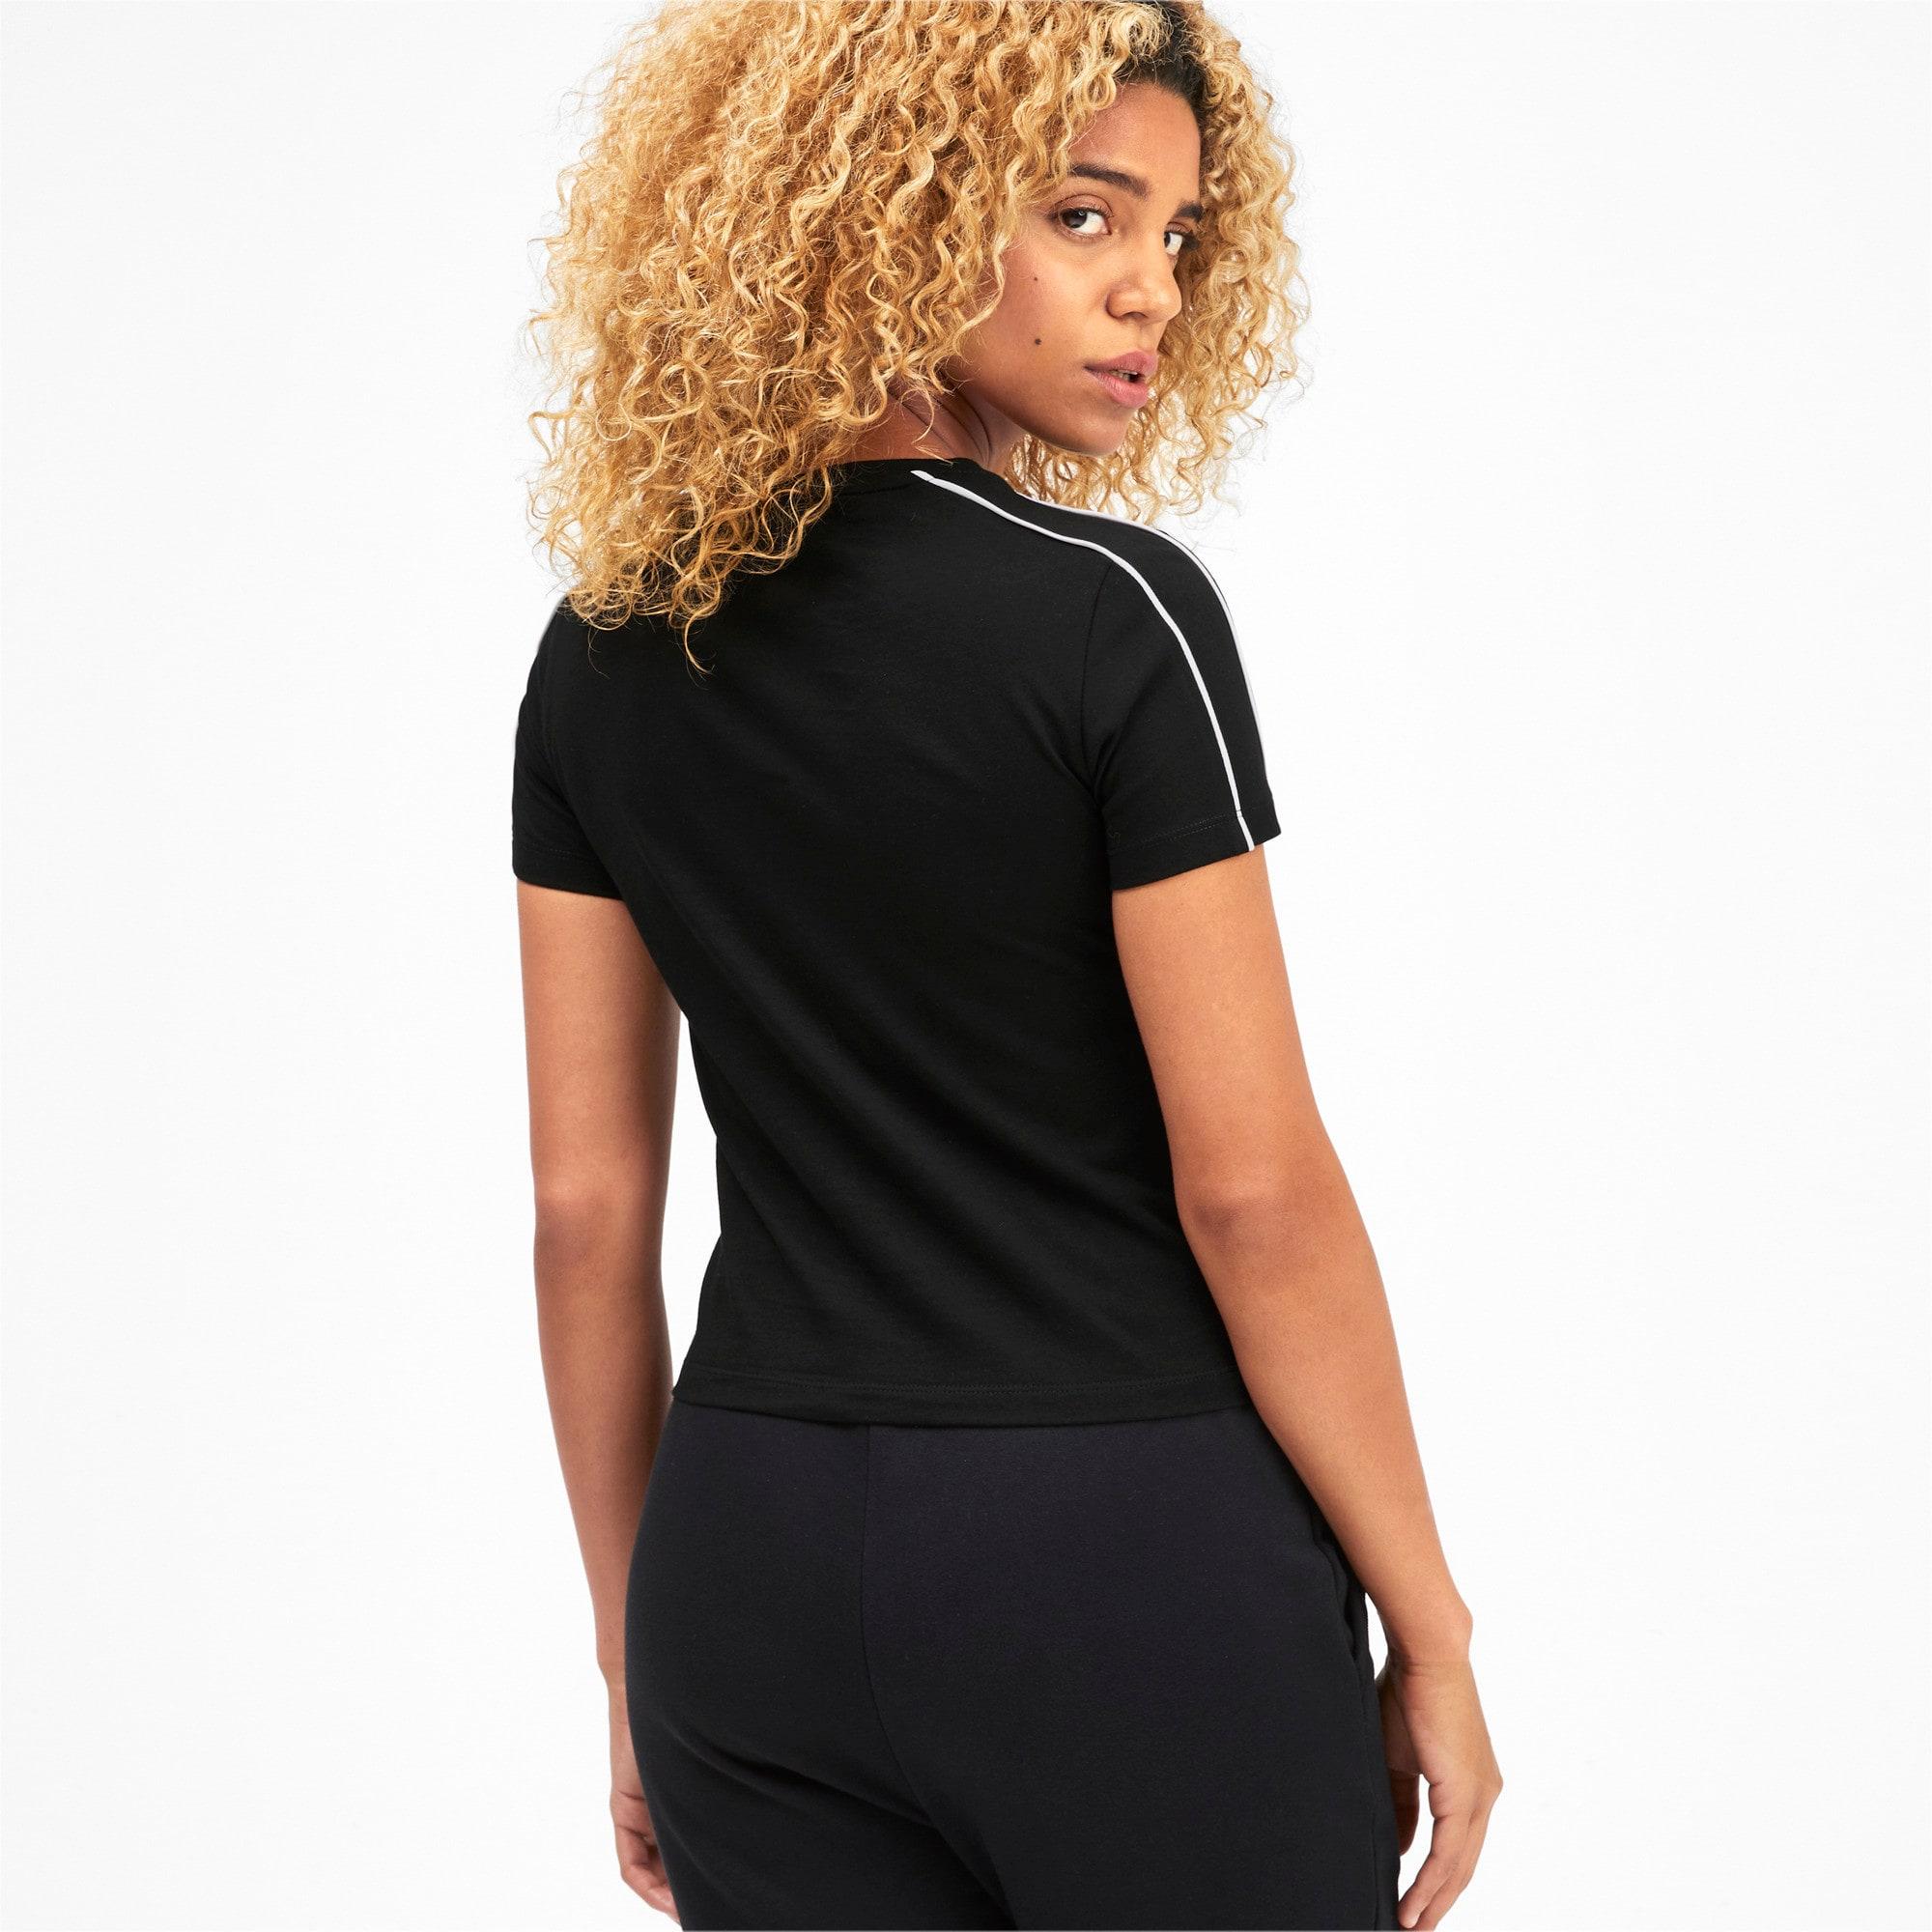 Thumbnail 2 of Classics Tight Women's Top, Puma Black, medium-SEA